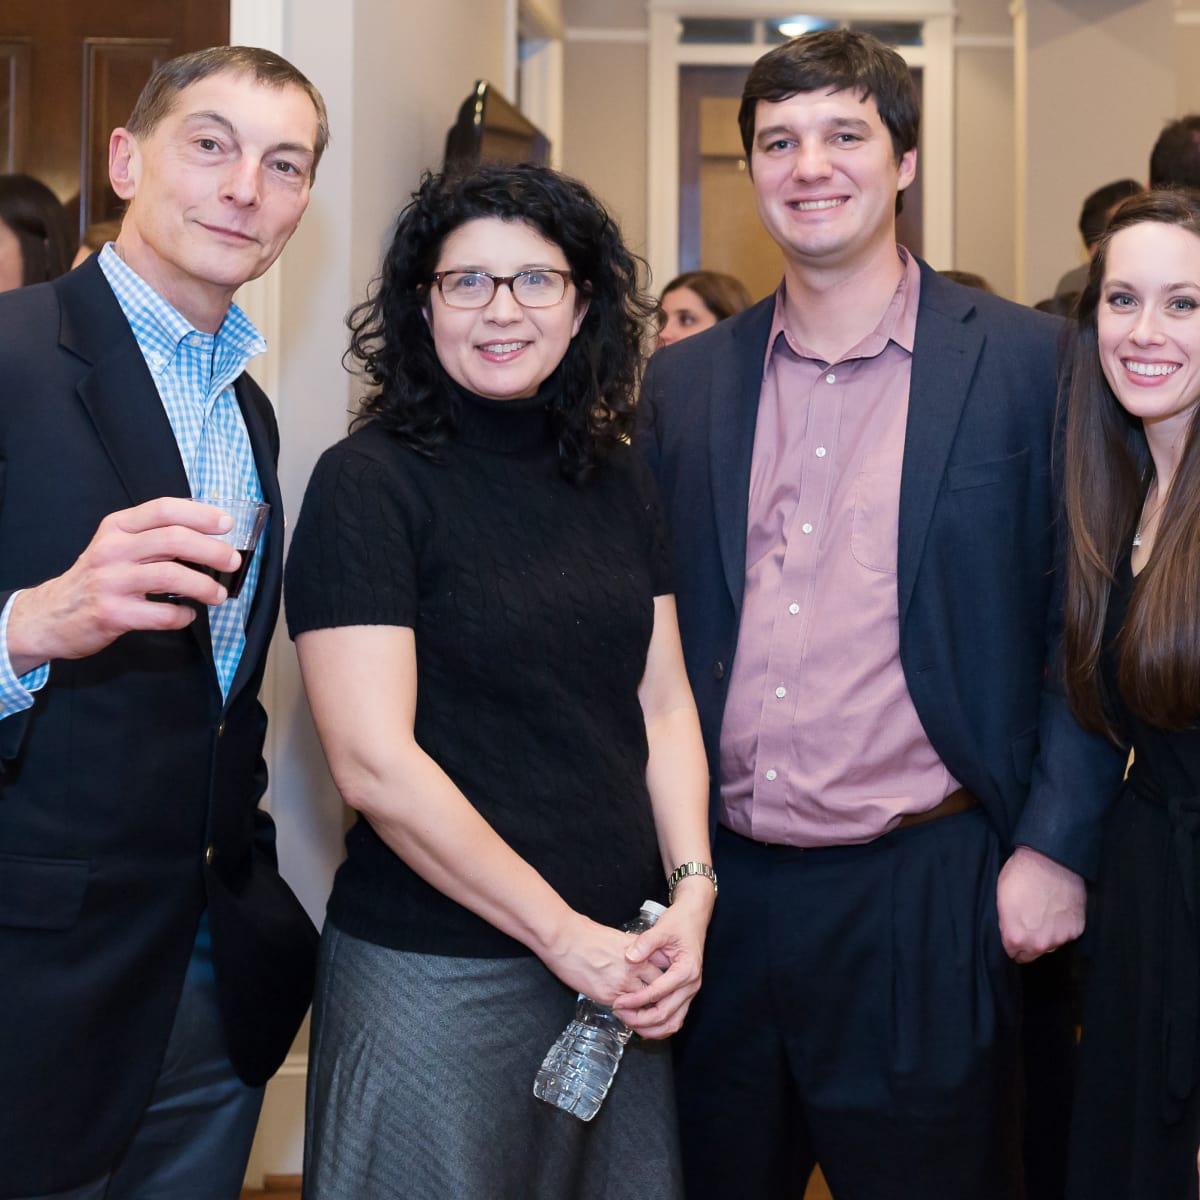 Opera in the Heights, Jan. 2016, Bravissimo_Tony Tripodo, Susanne Gealy, Boron Buturovic, Marianne Terrel